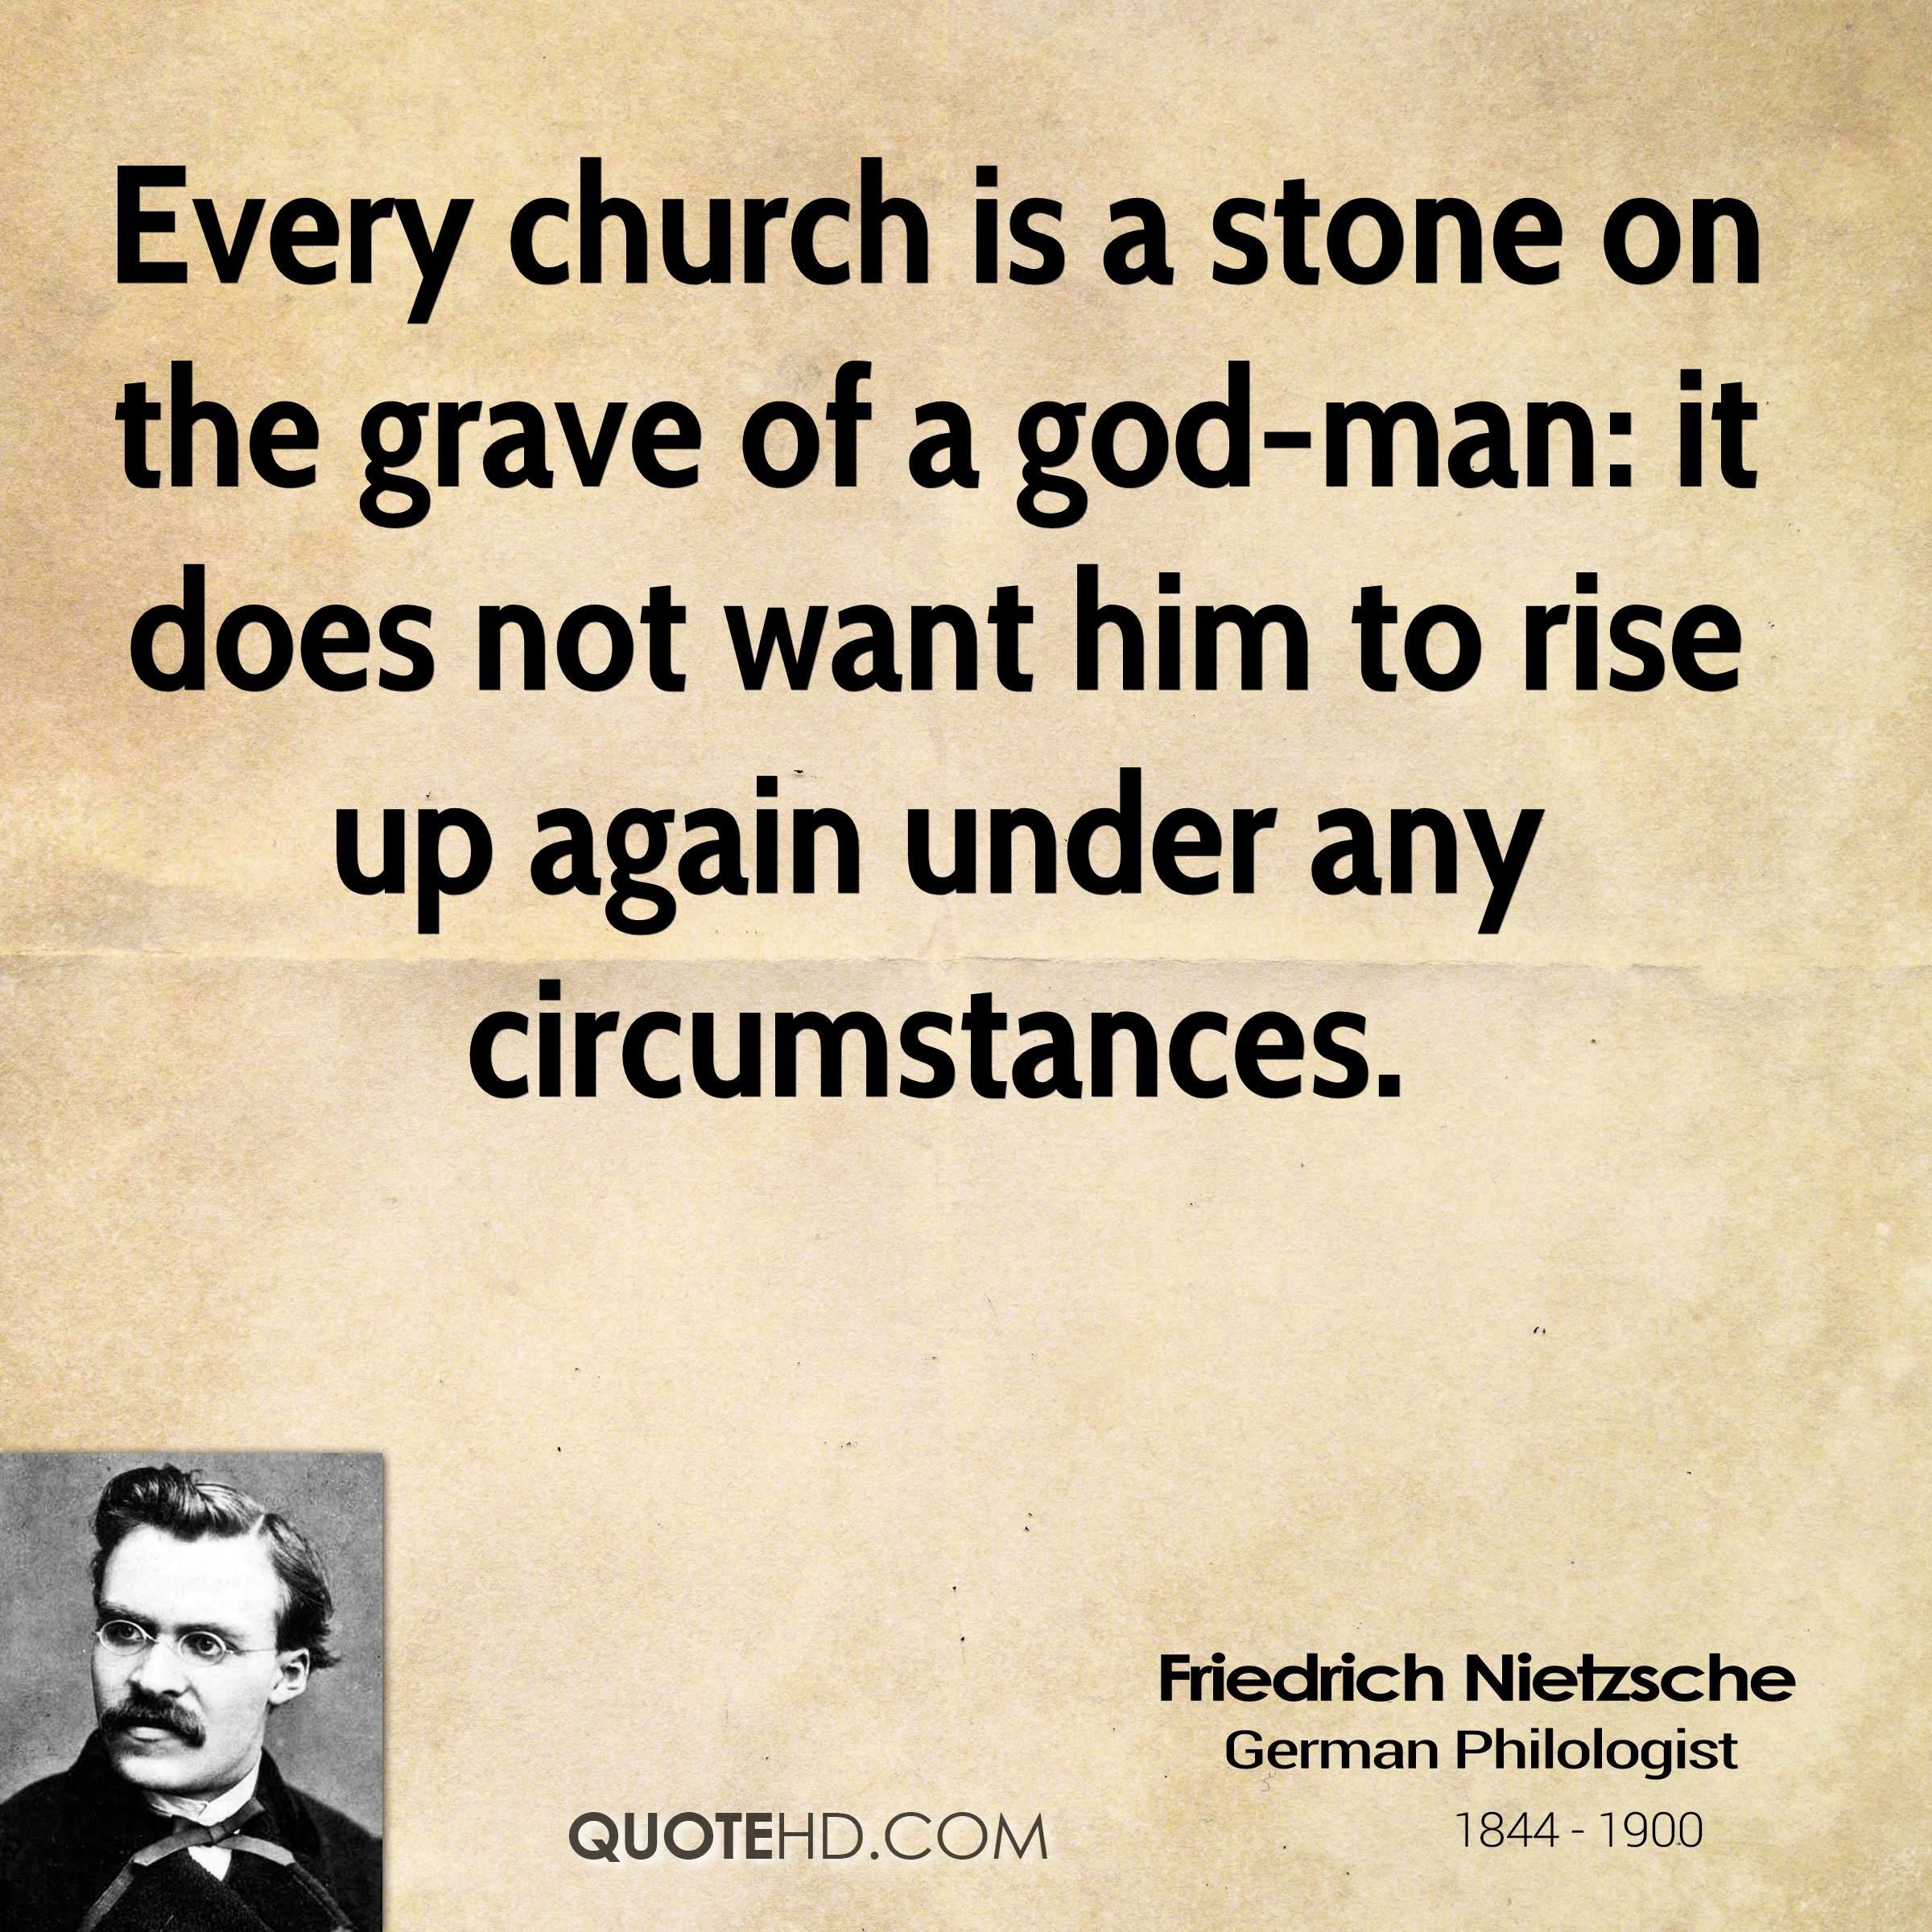 nietzsche quotes on god quotesgram